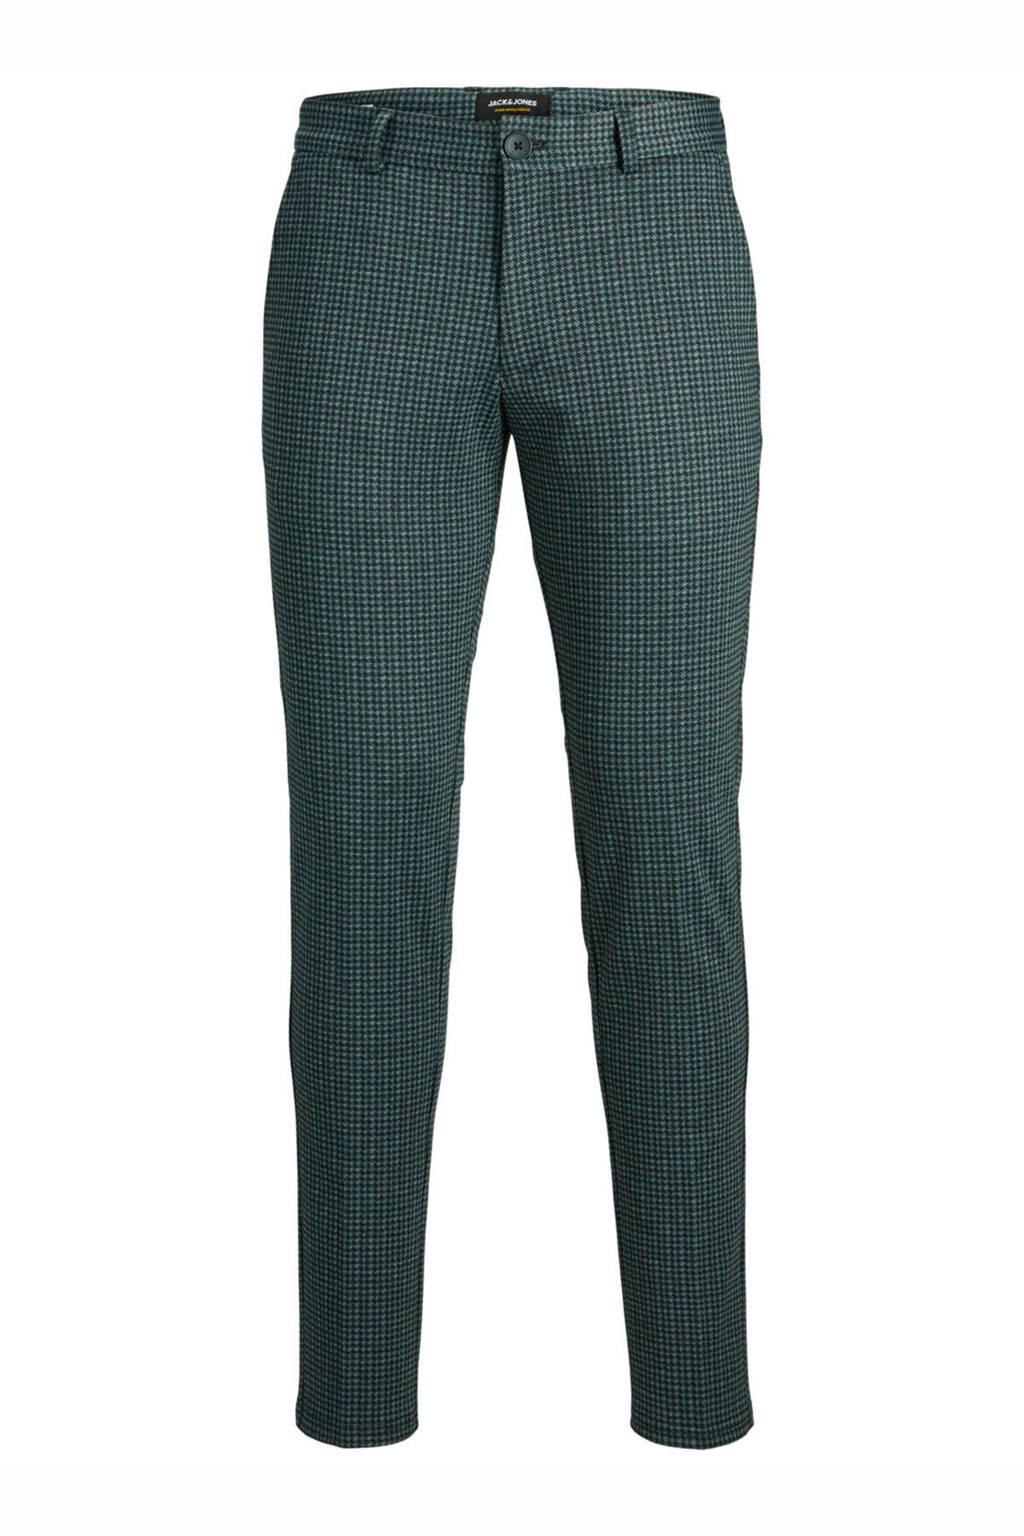 JACK & JONES JEANS INTELLIGENCE geruite slim fit pantalon Marco groen, Groen